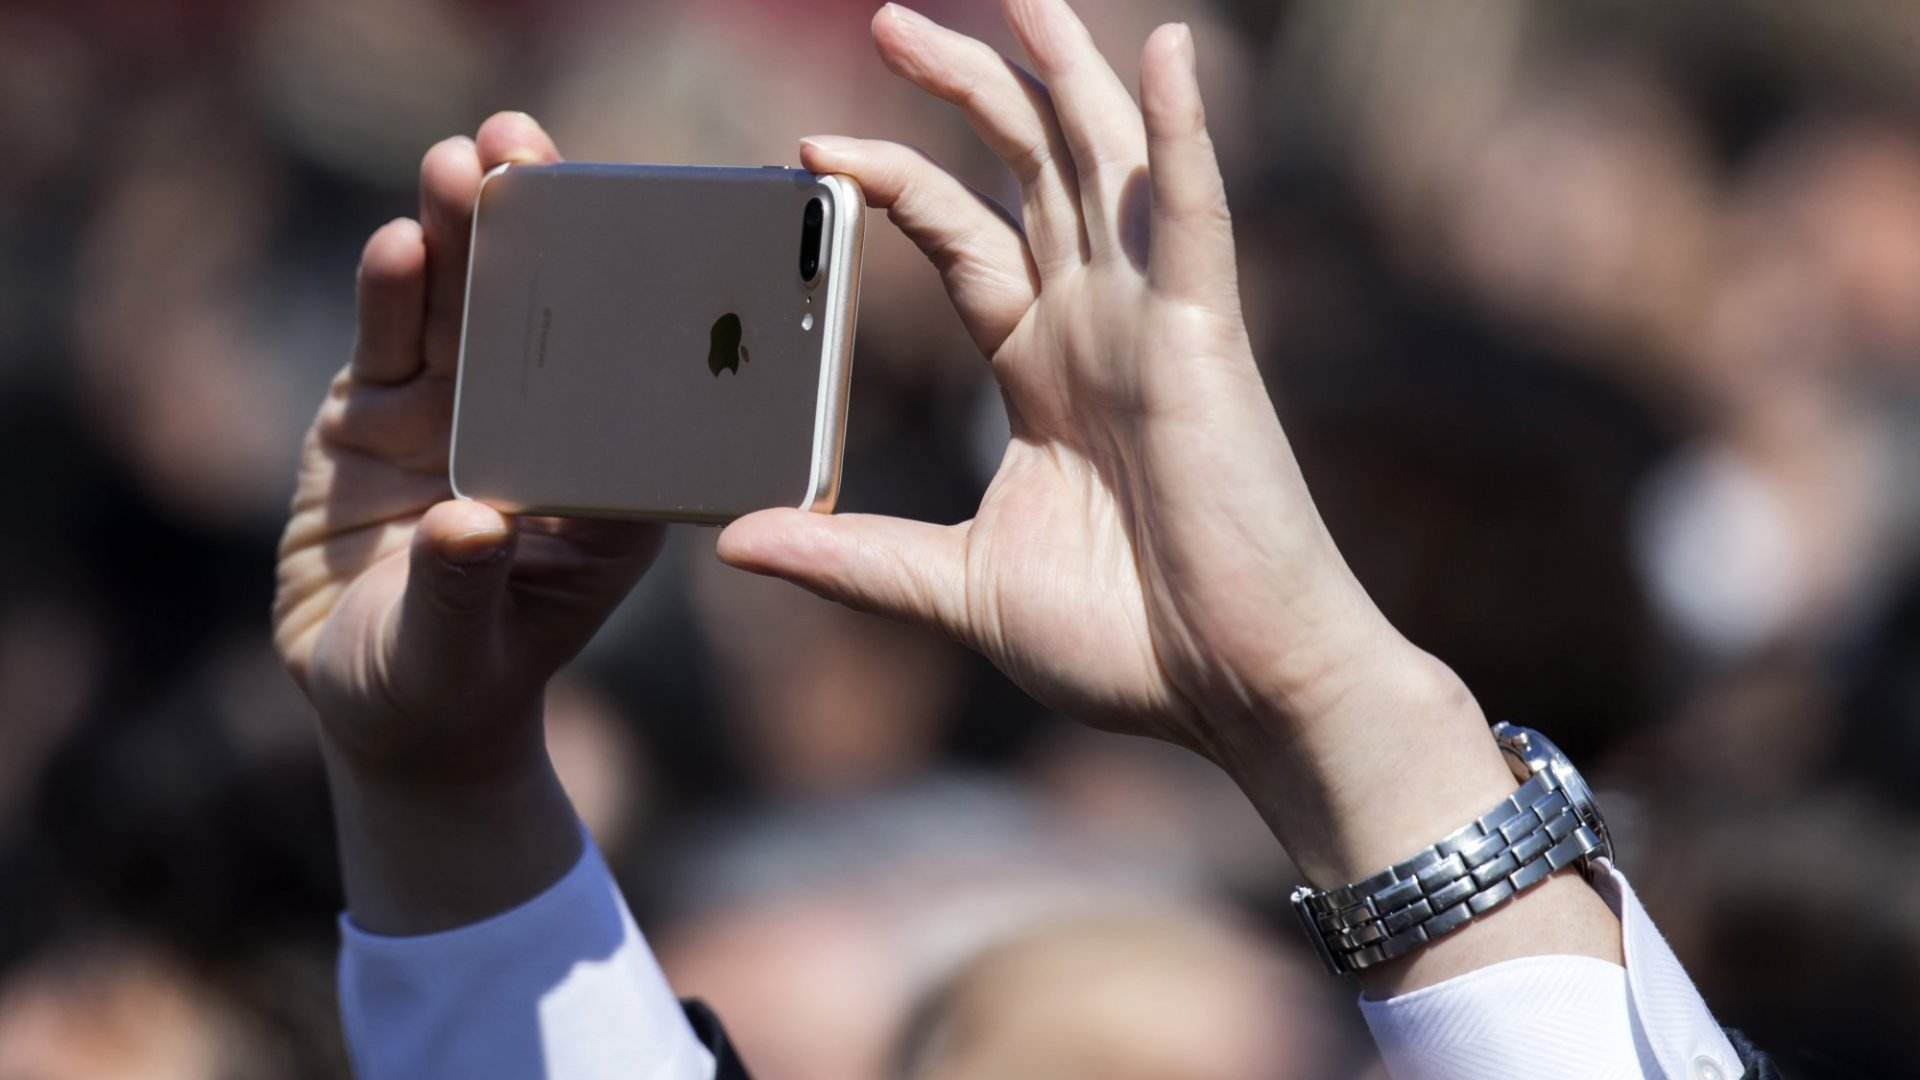 Social Media vs. Having a Life: 3 Ways to Strike a Balance